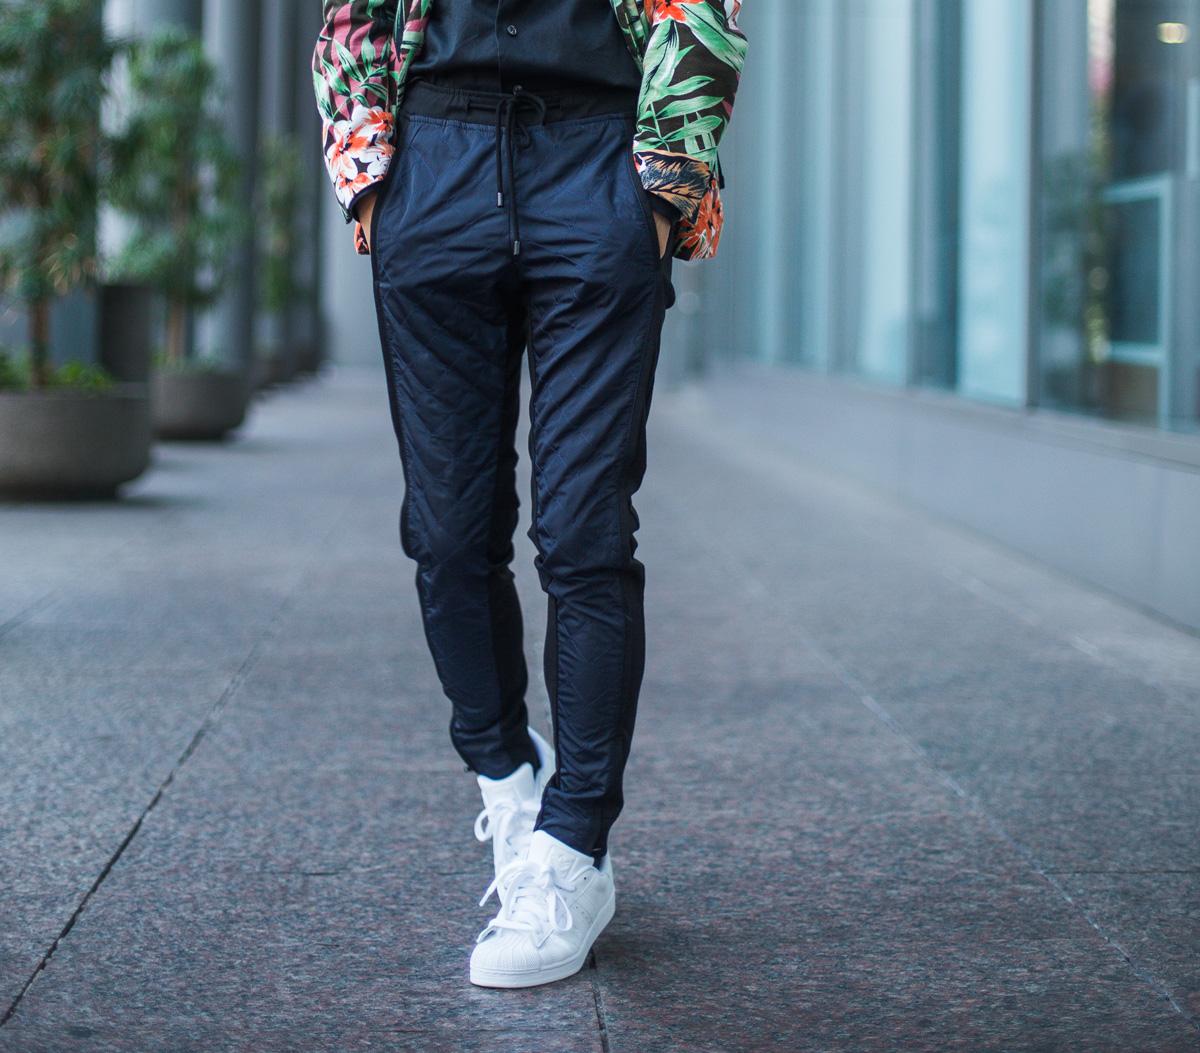 the-zara-floral-blazer-tommy-lei-mybelonging-menswear-6.jpg